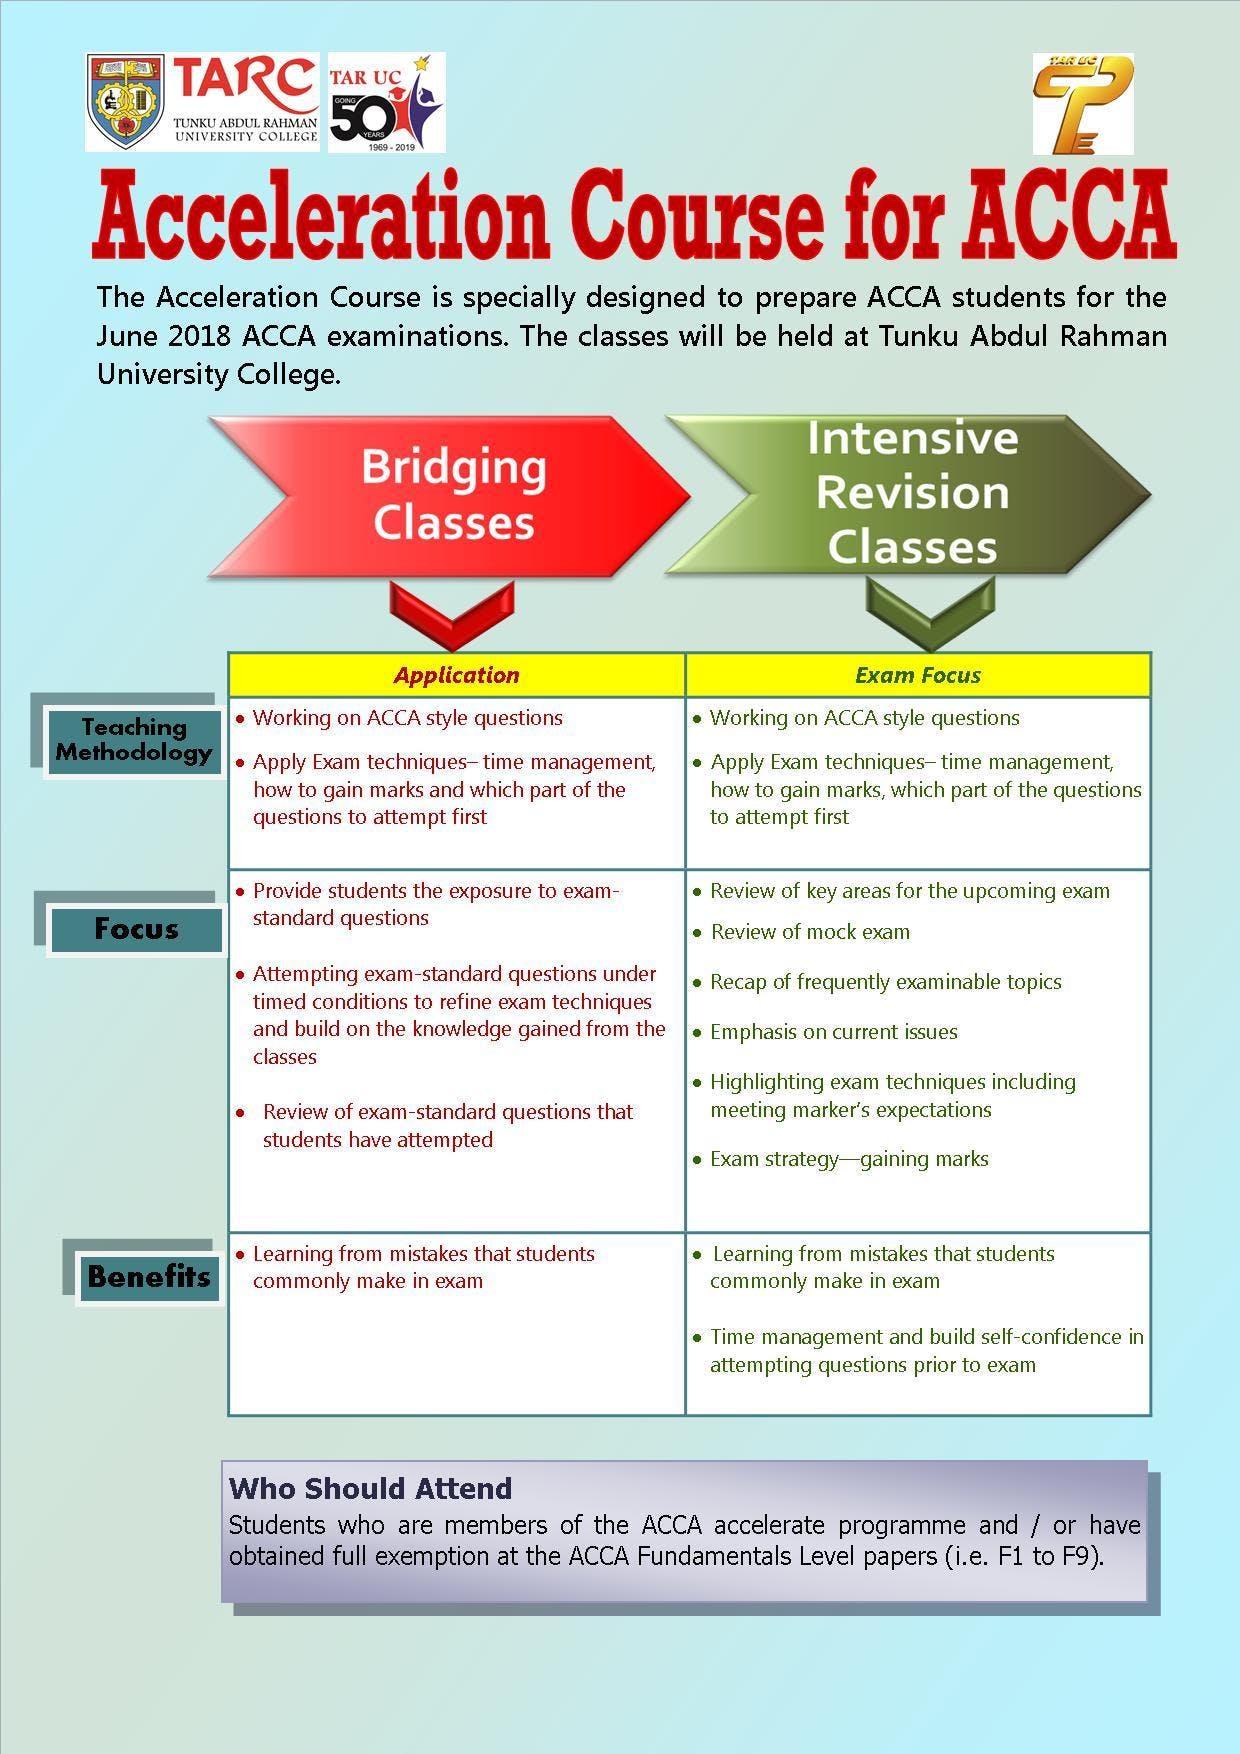 Acceleration Course for ACCA at Tunku Abdul Rahman University